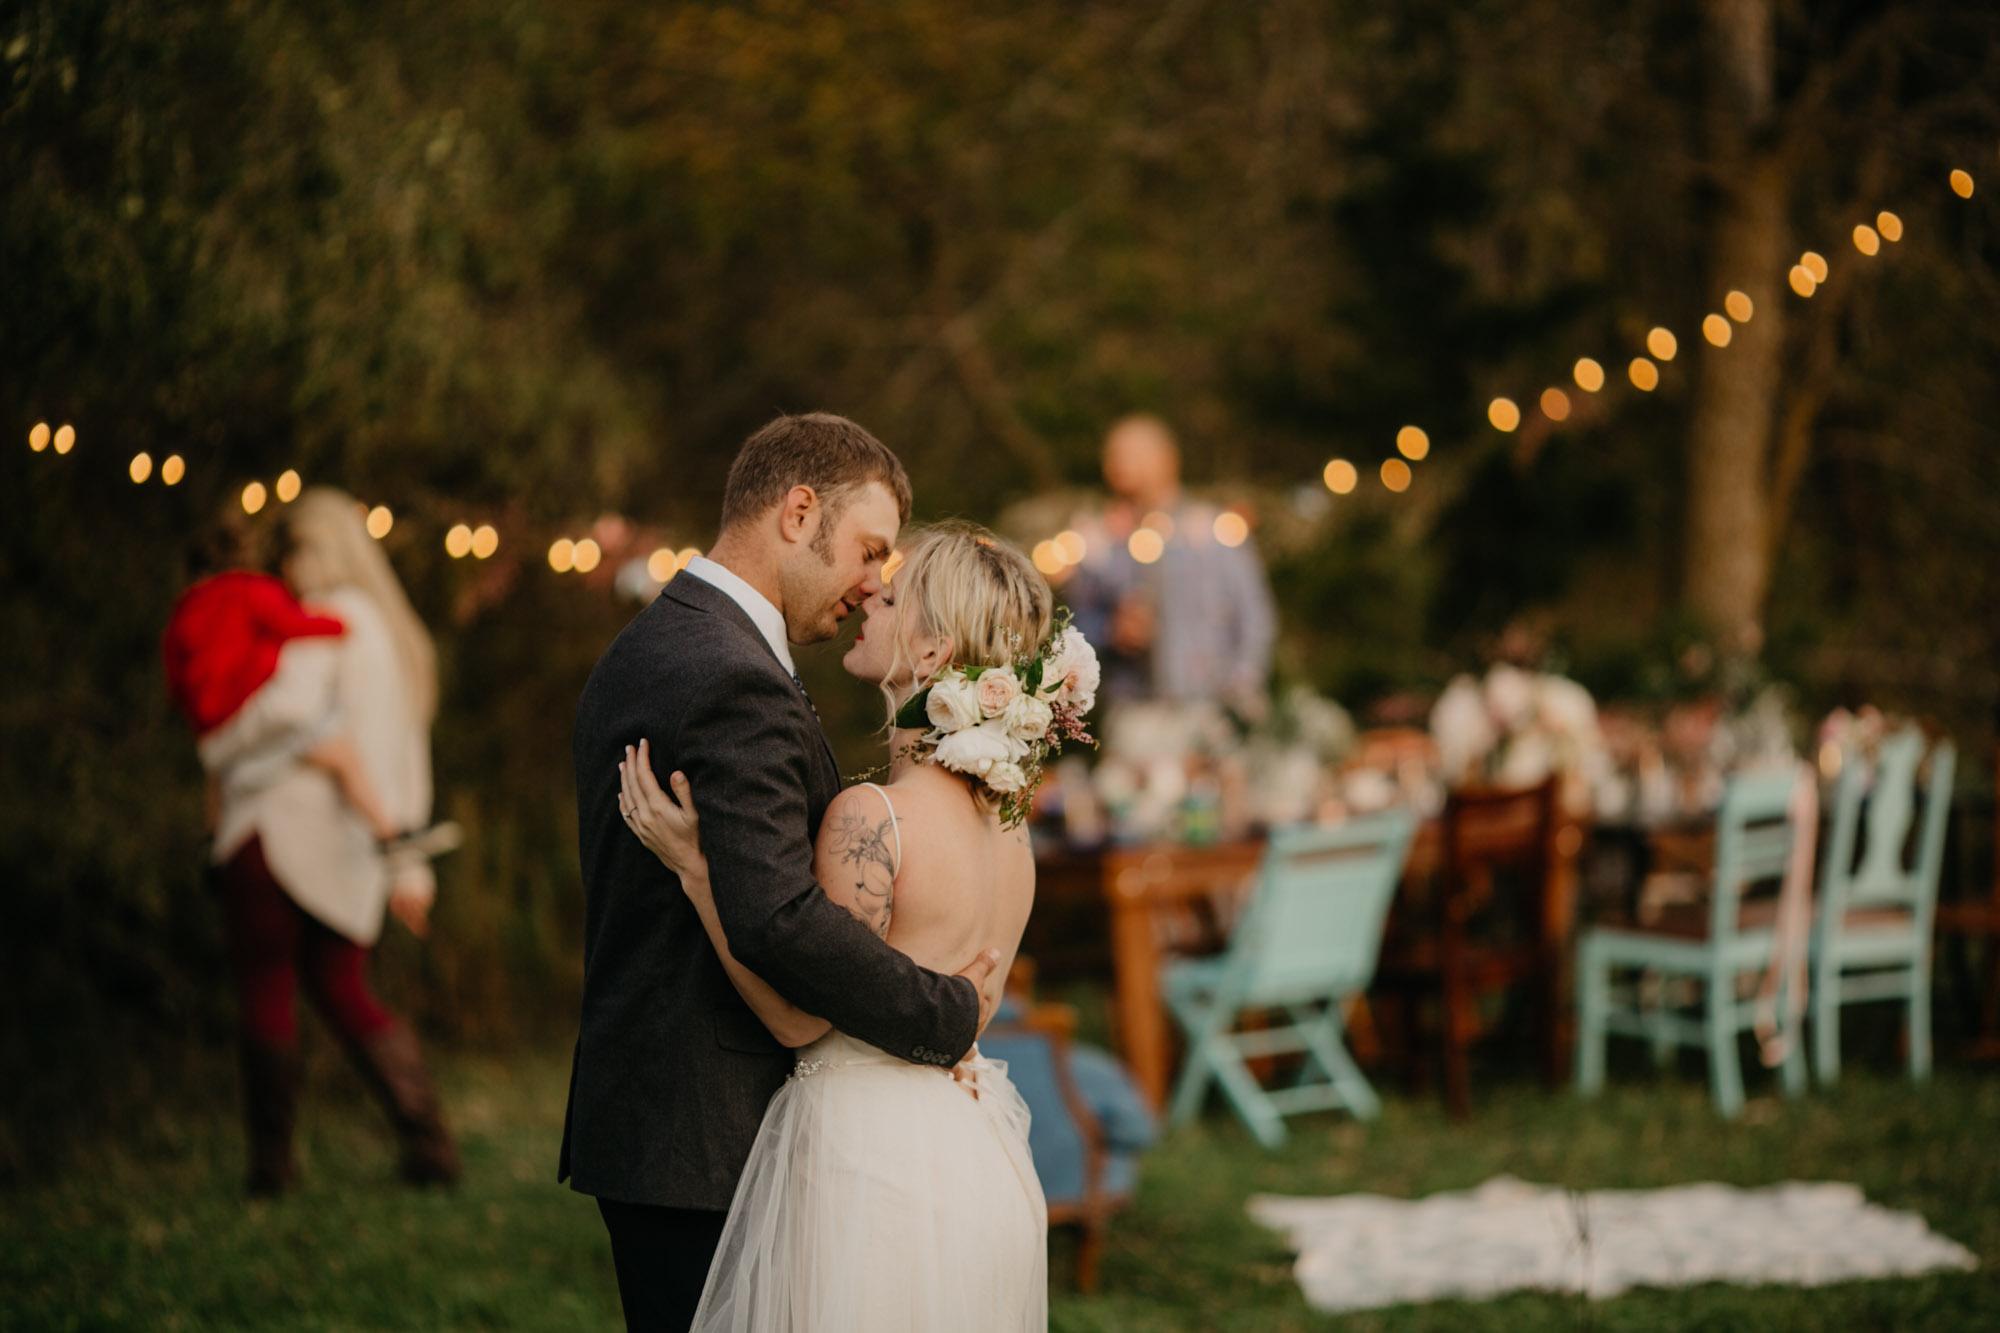 omaha-wedding-photographer-meghan-time-50.jpg